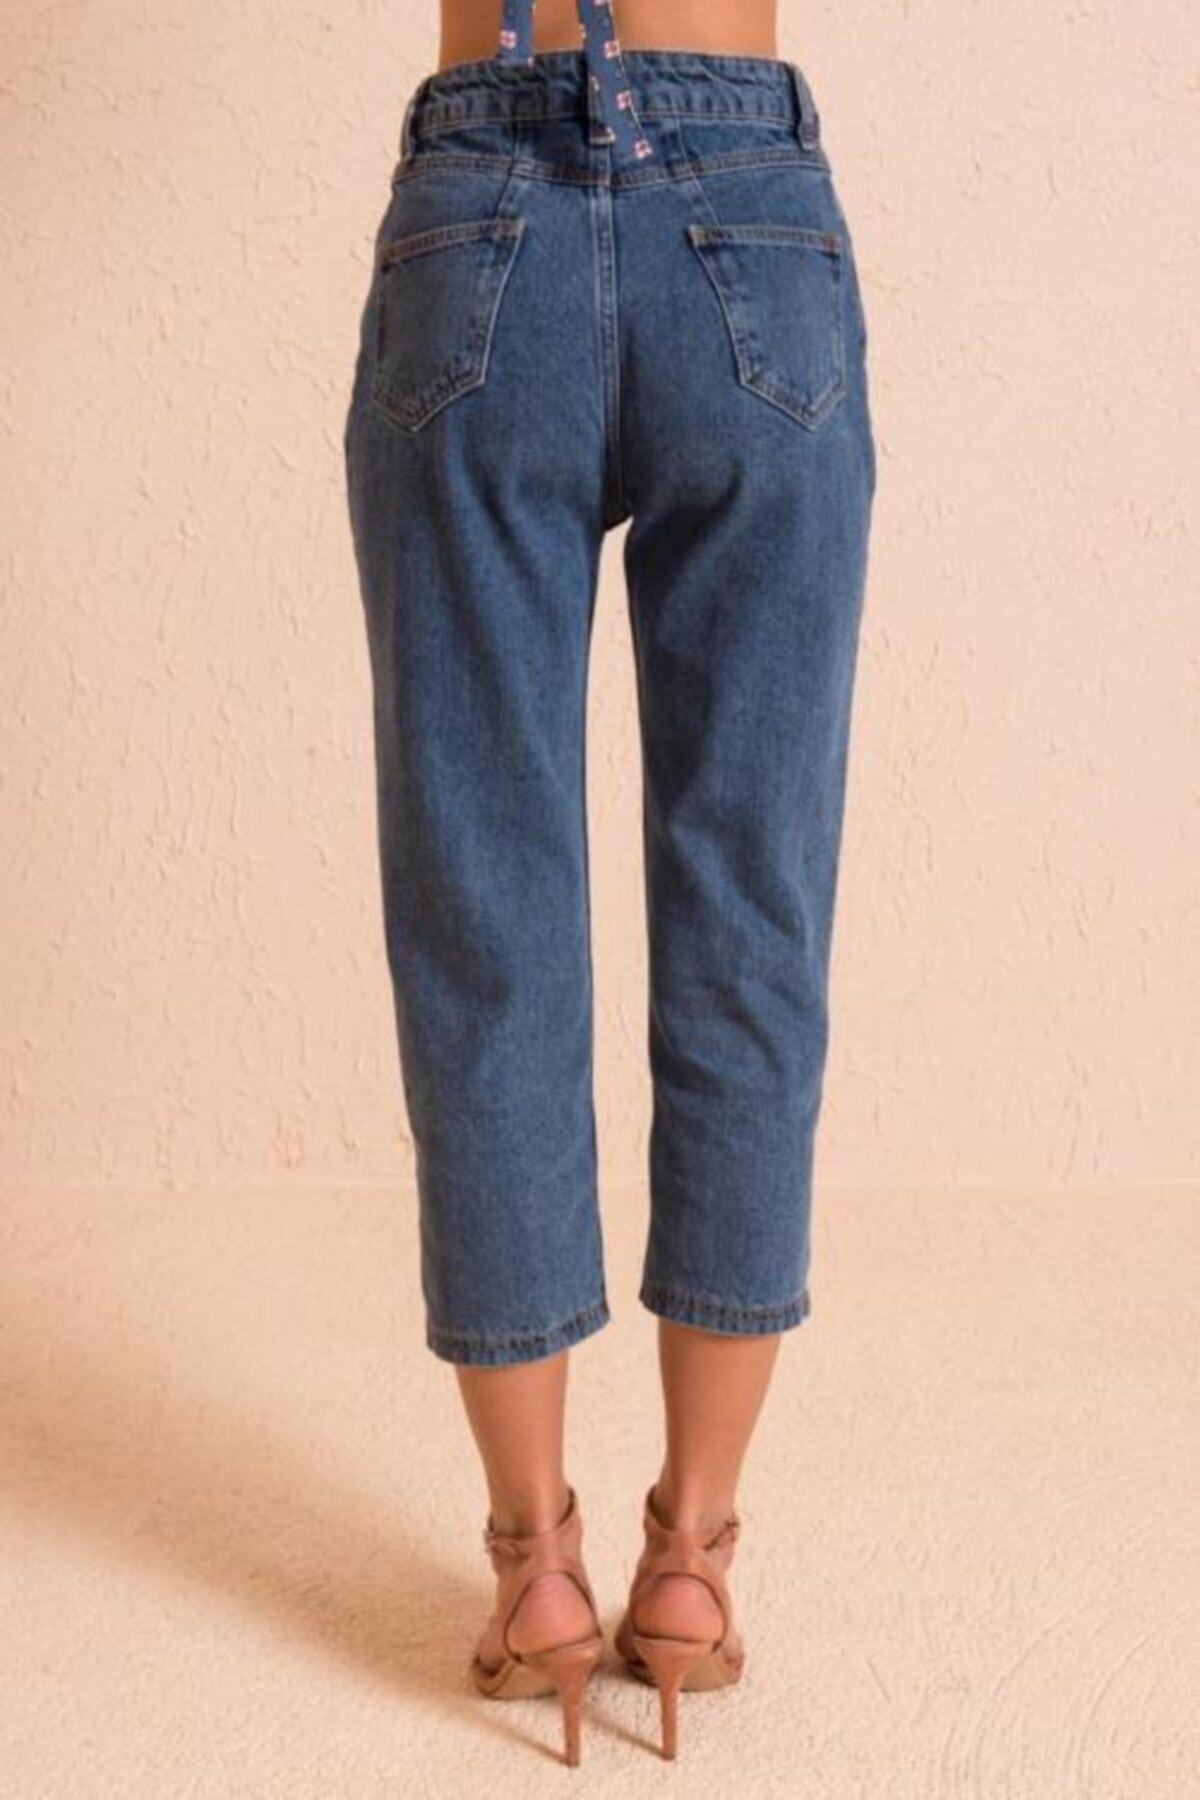 BSL Kadın Mavi Boru Paça Fermuar Detaylı Jean Pantolon 2